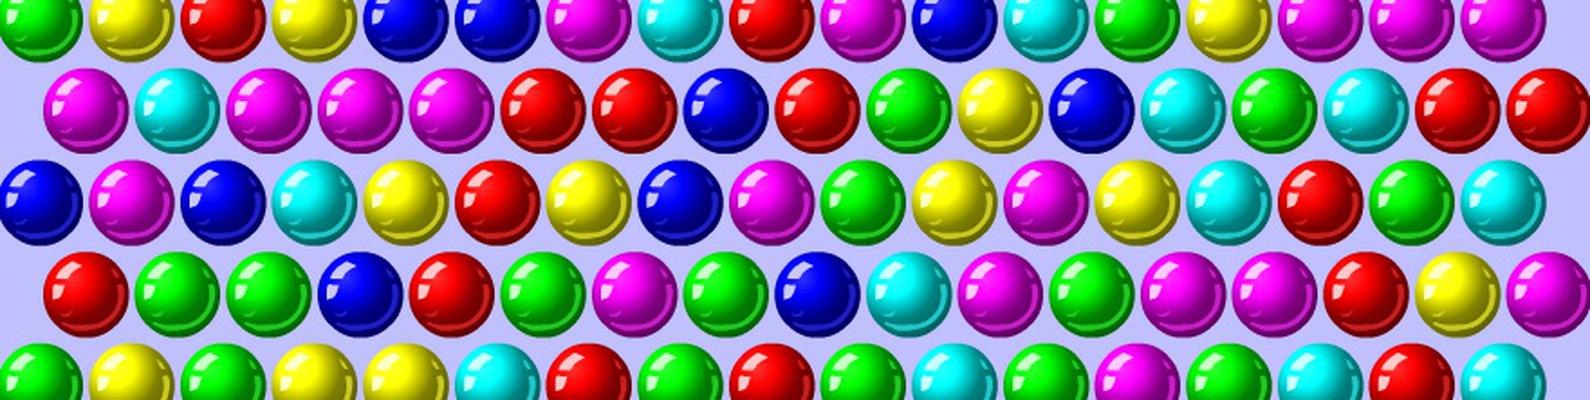 Тетрис стрелялки онлайн шарики скачать стрелялки самые лучшие онлайн